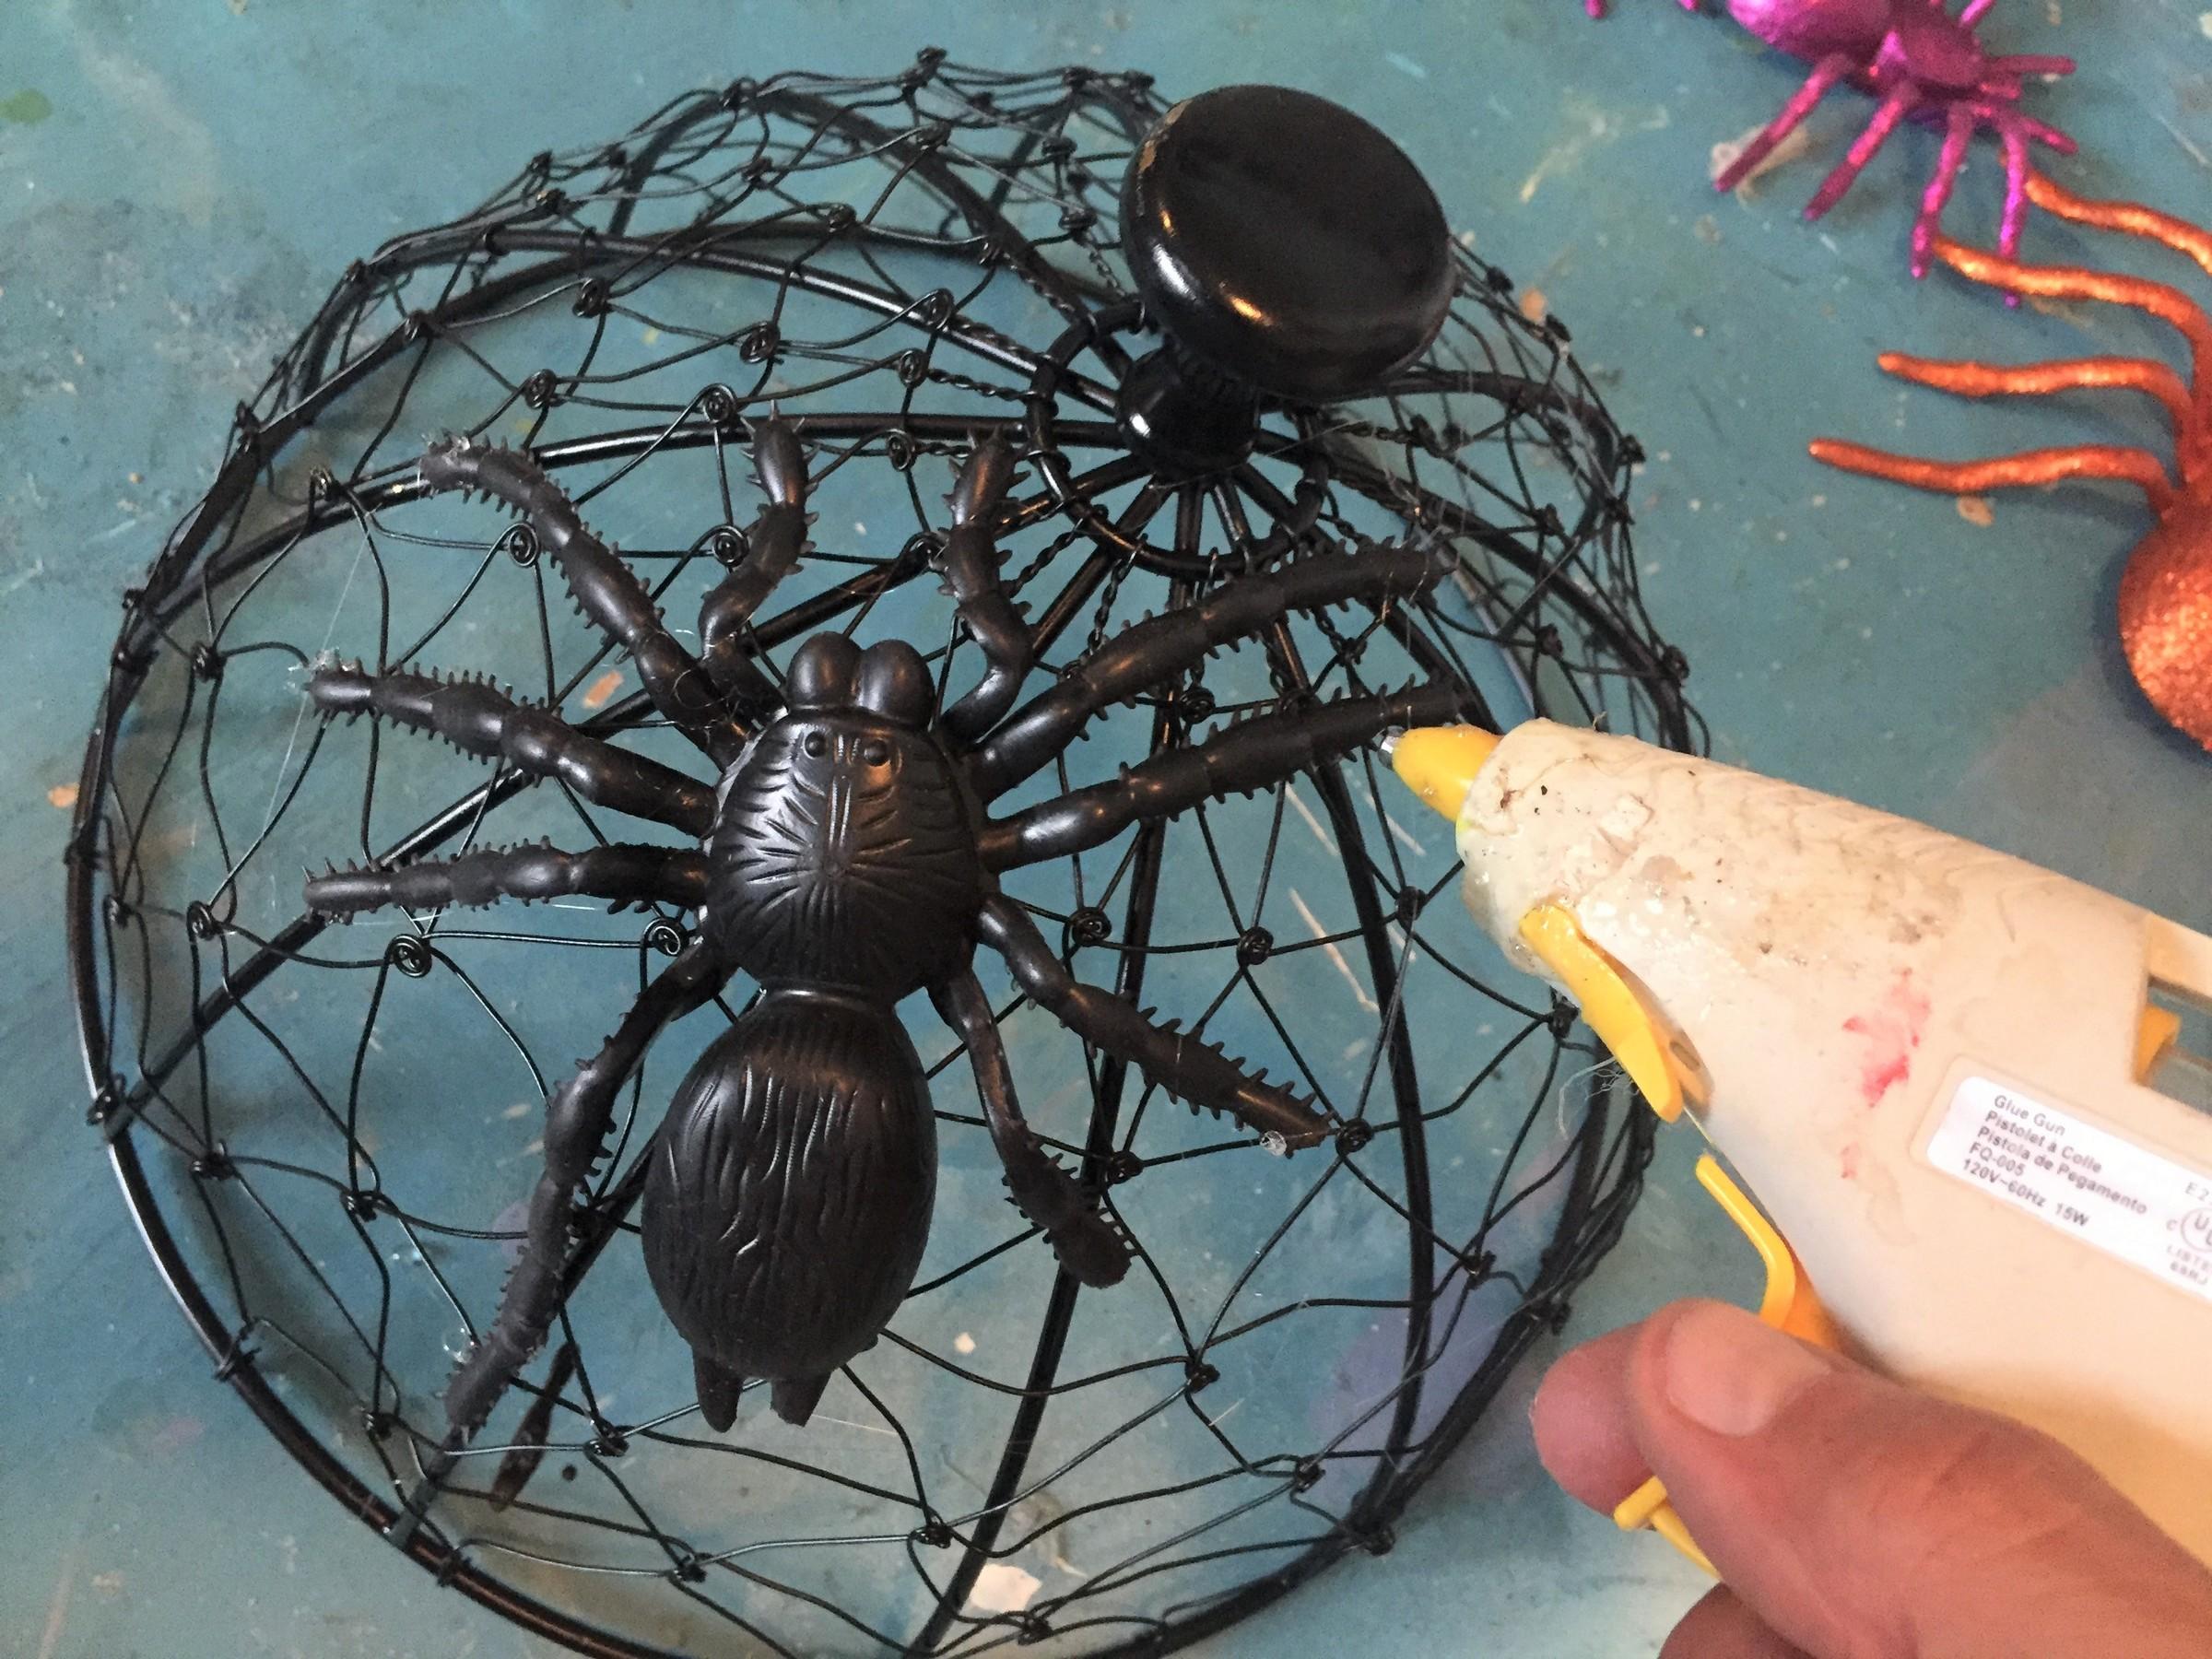 Tim glues a fake spider onto the spray-painted server